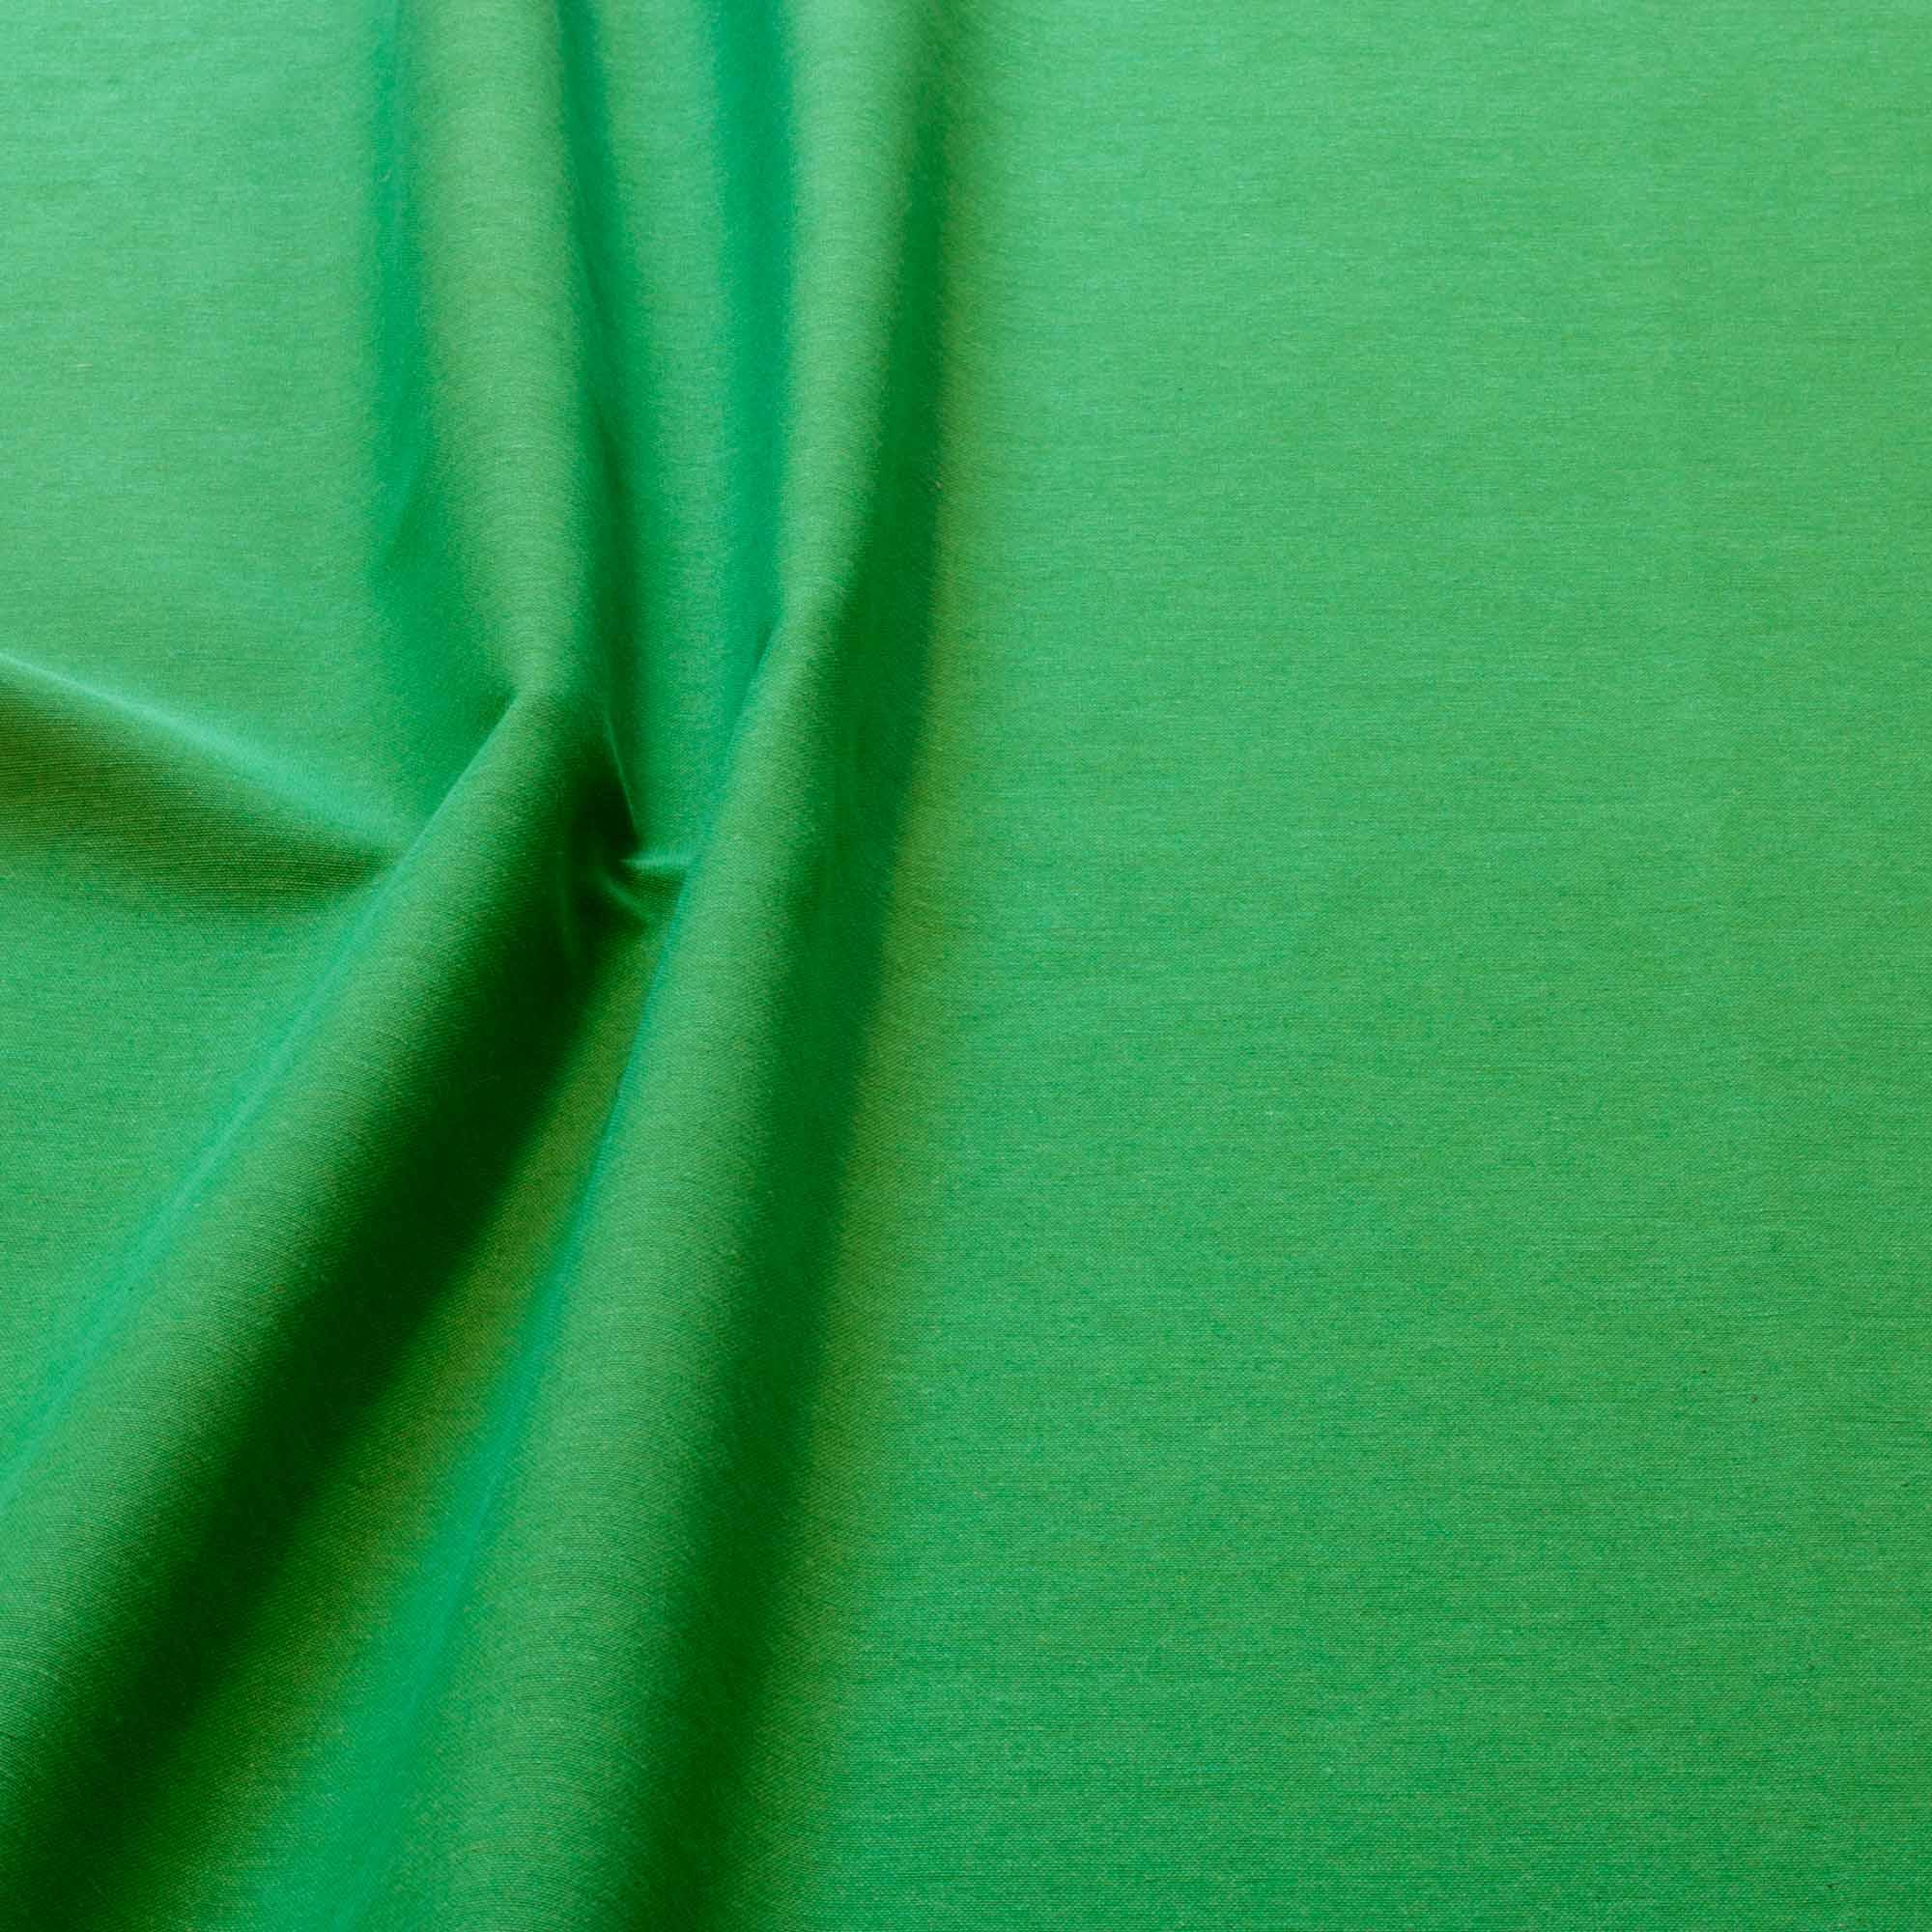 Tecido Alpaca para Forro 1,40 Mt Largura Verde Bandeira